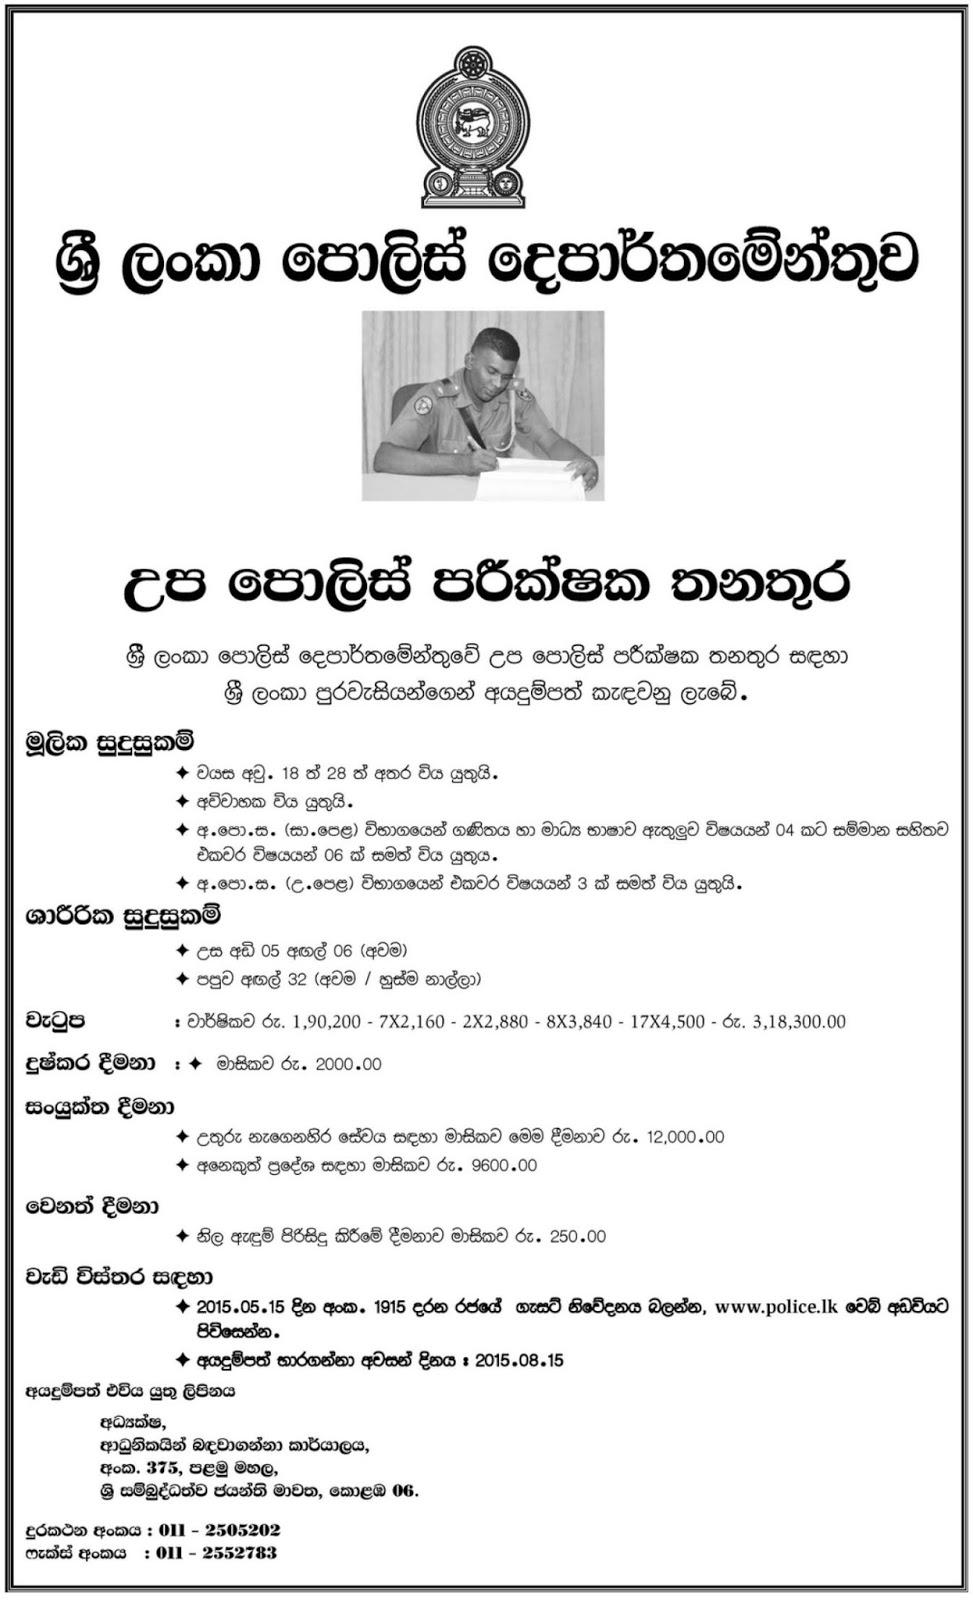 Sri Lanka Police Vacancies Si Post Gazette Sri Lanka